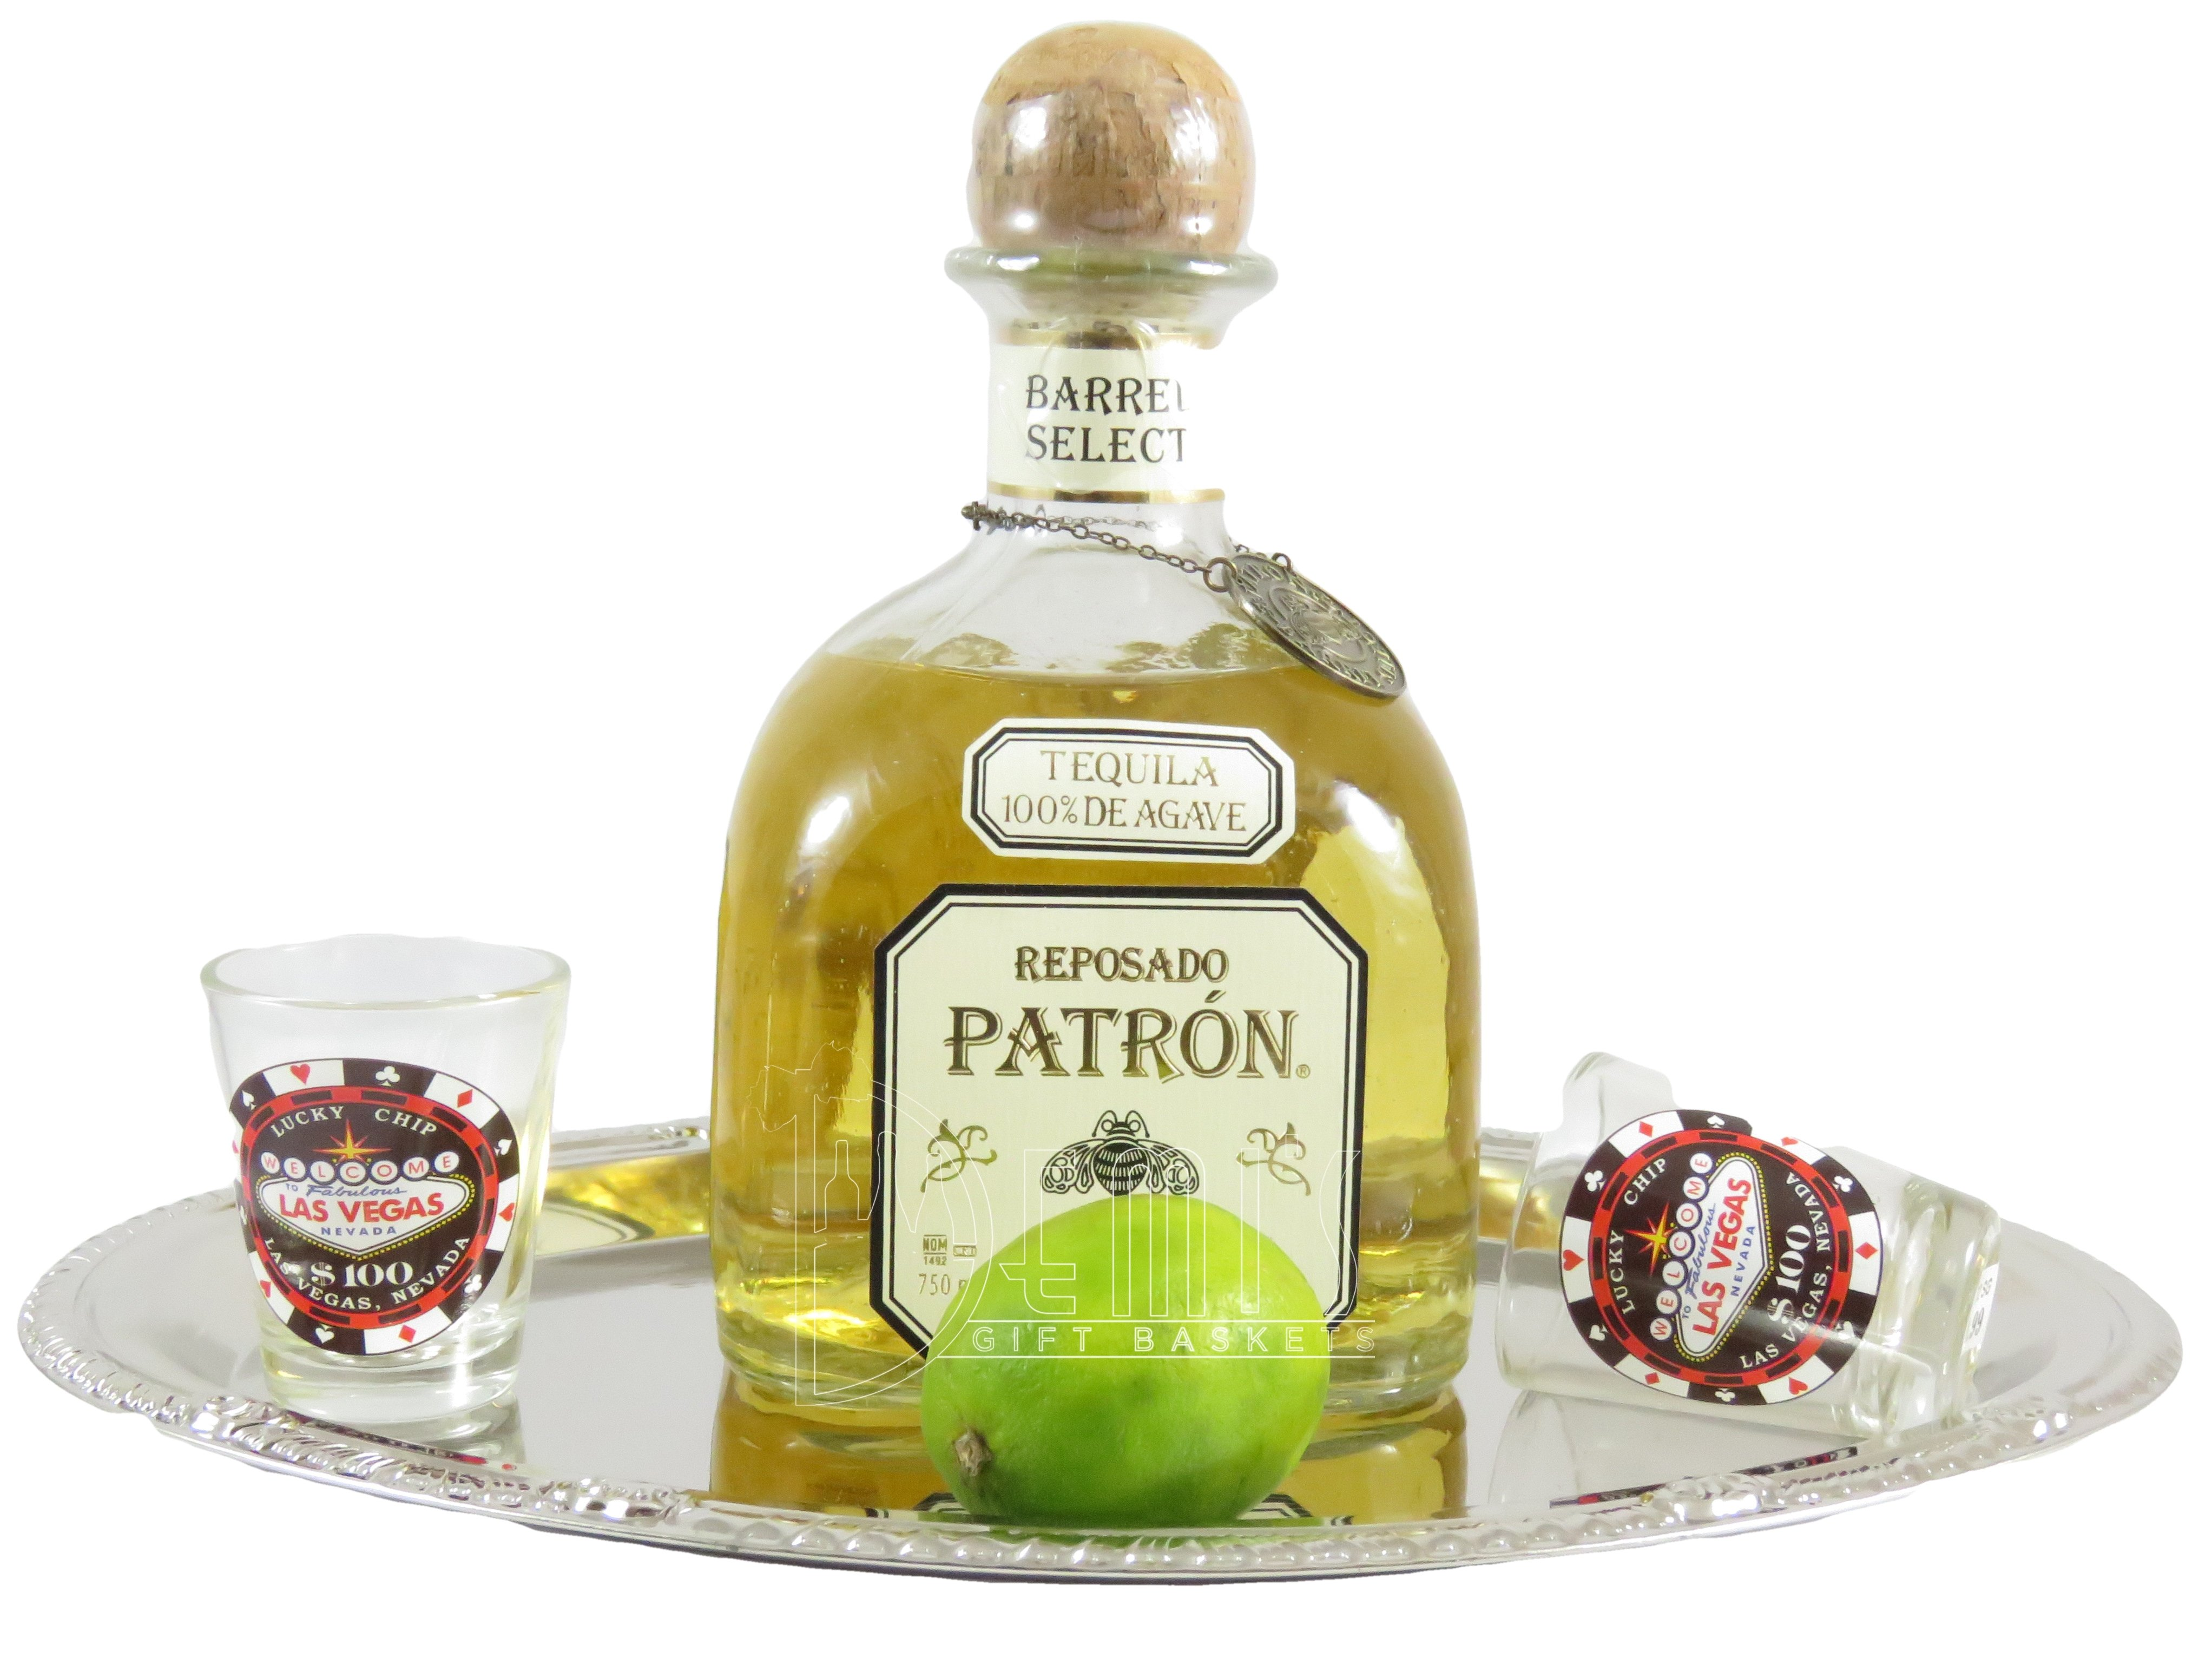 Bottle of Booze CSS-0018